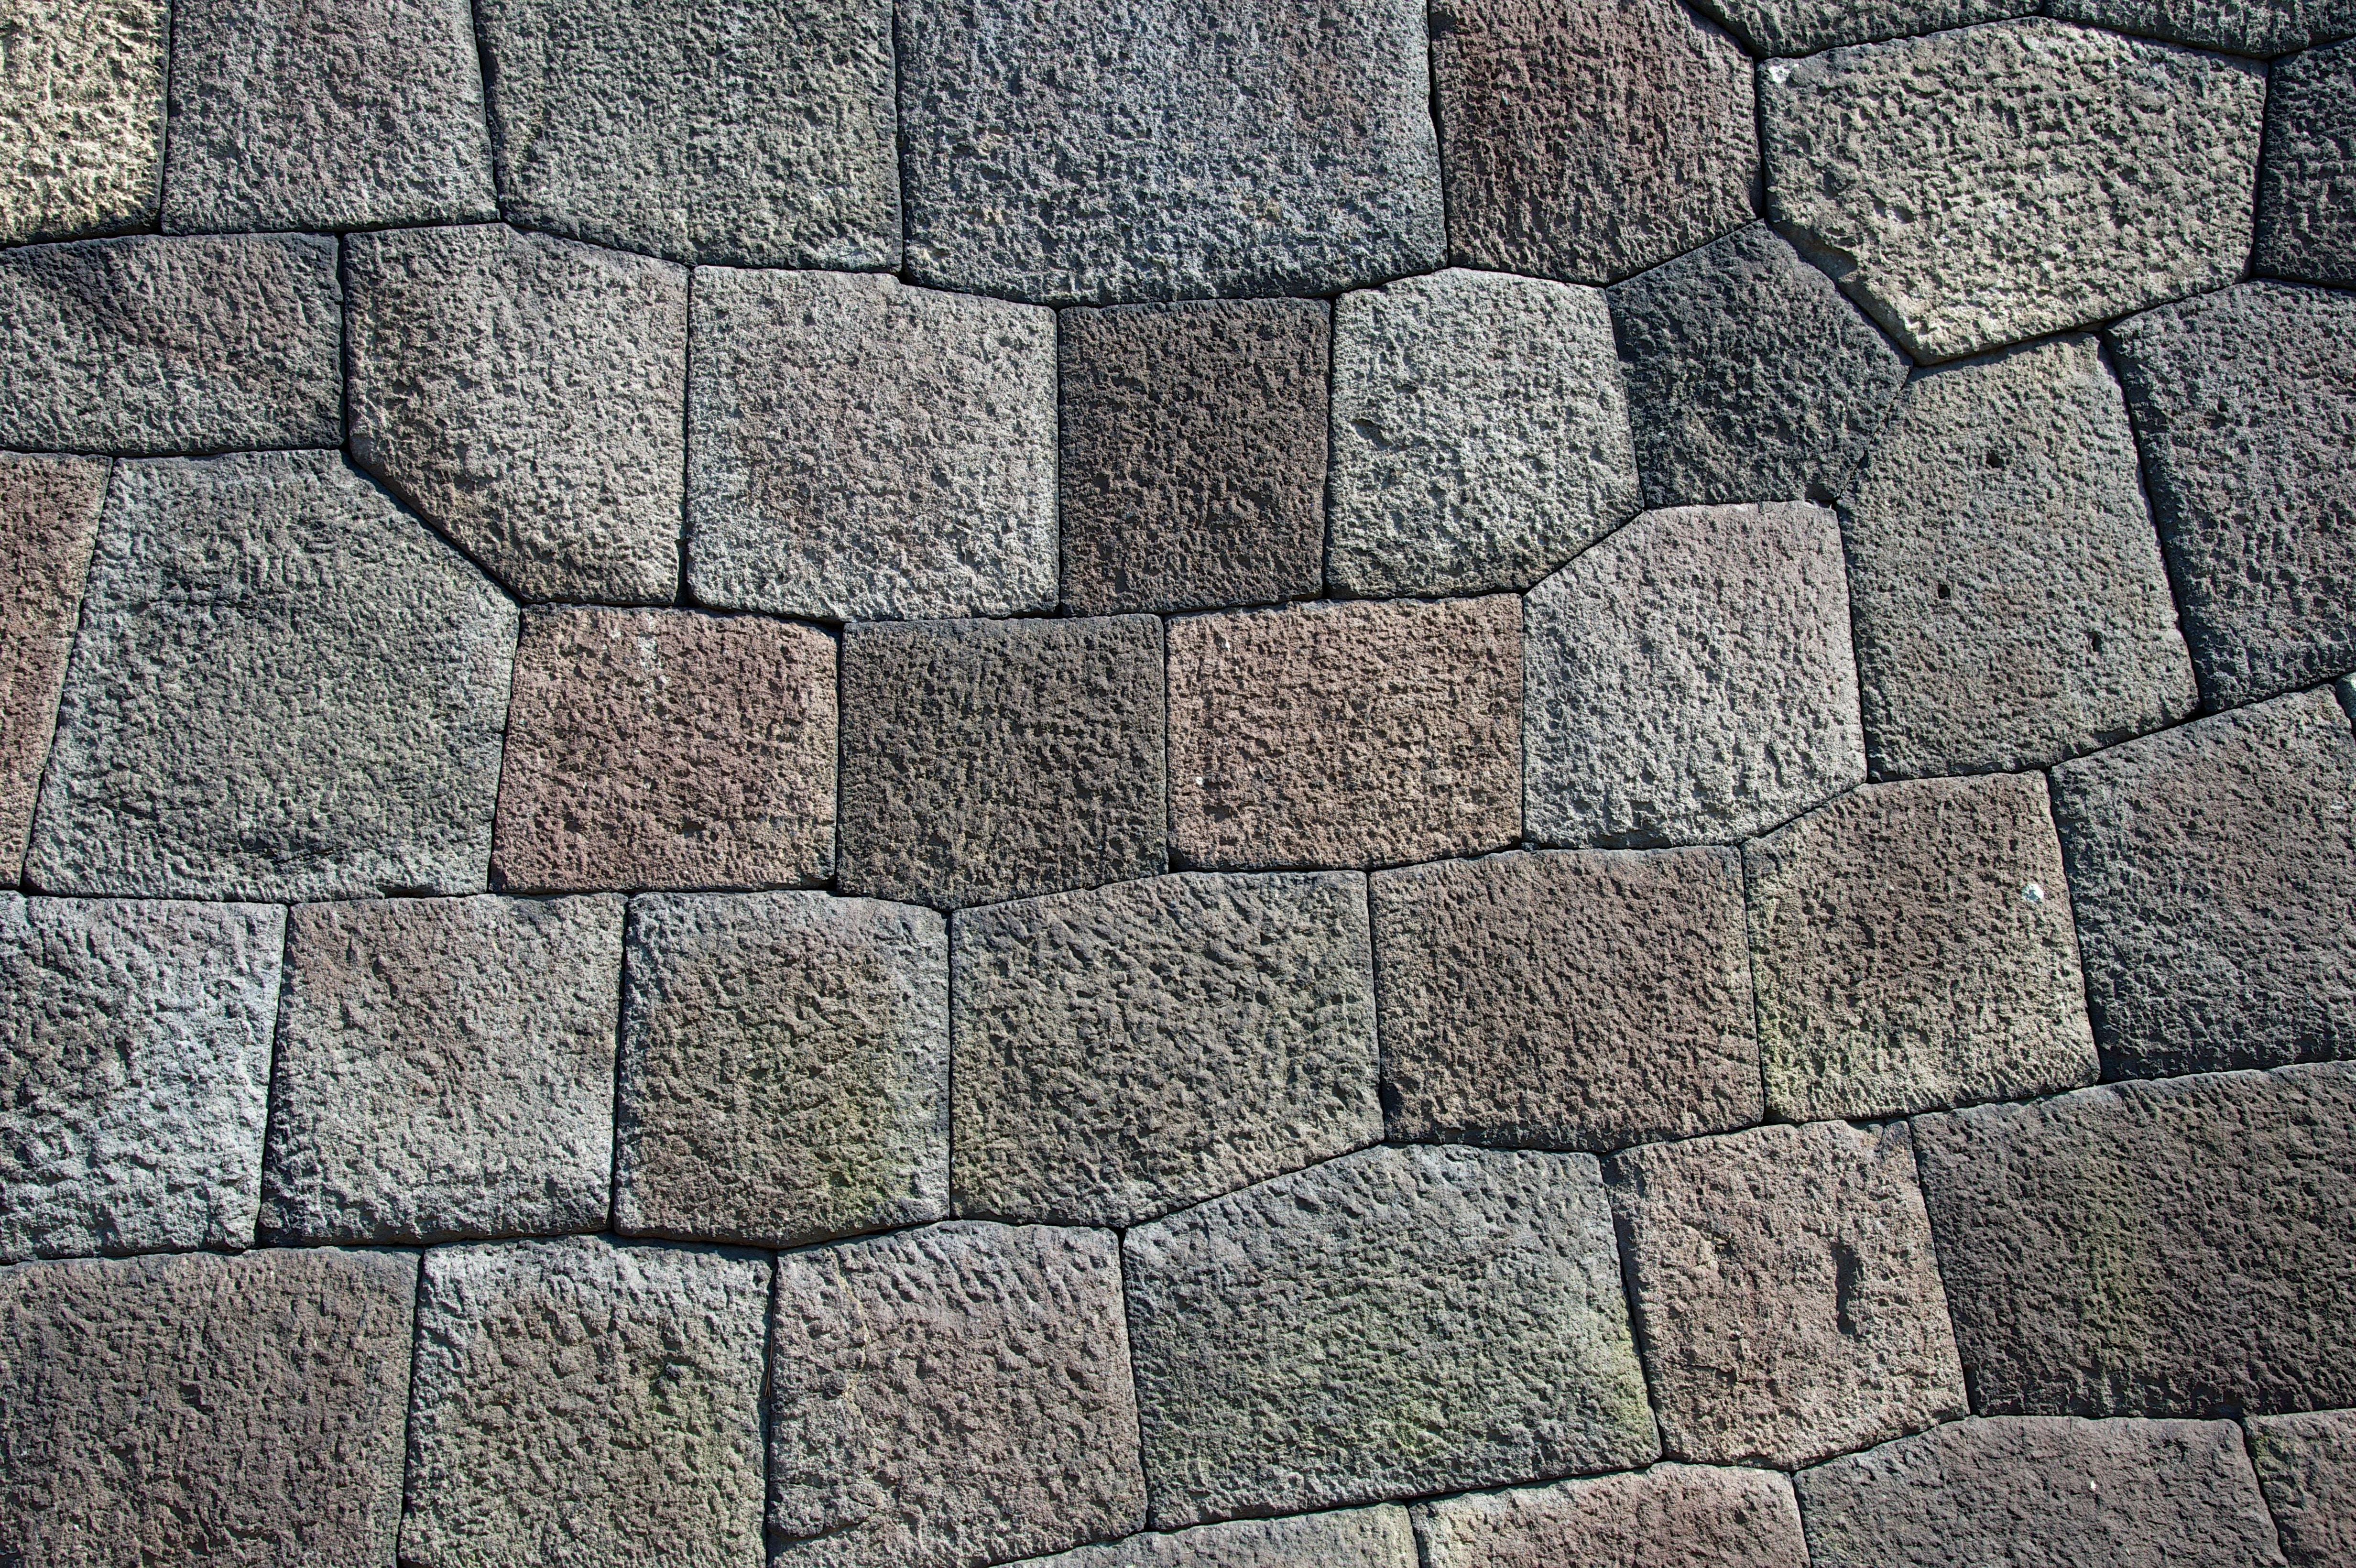 close up photography of concrete brick pavement